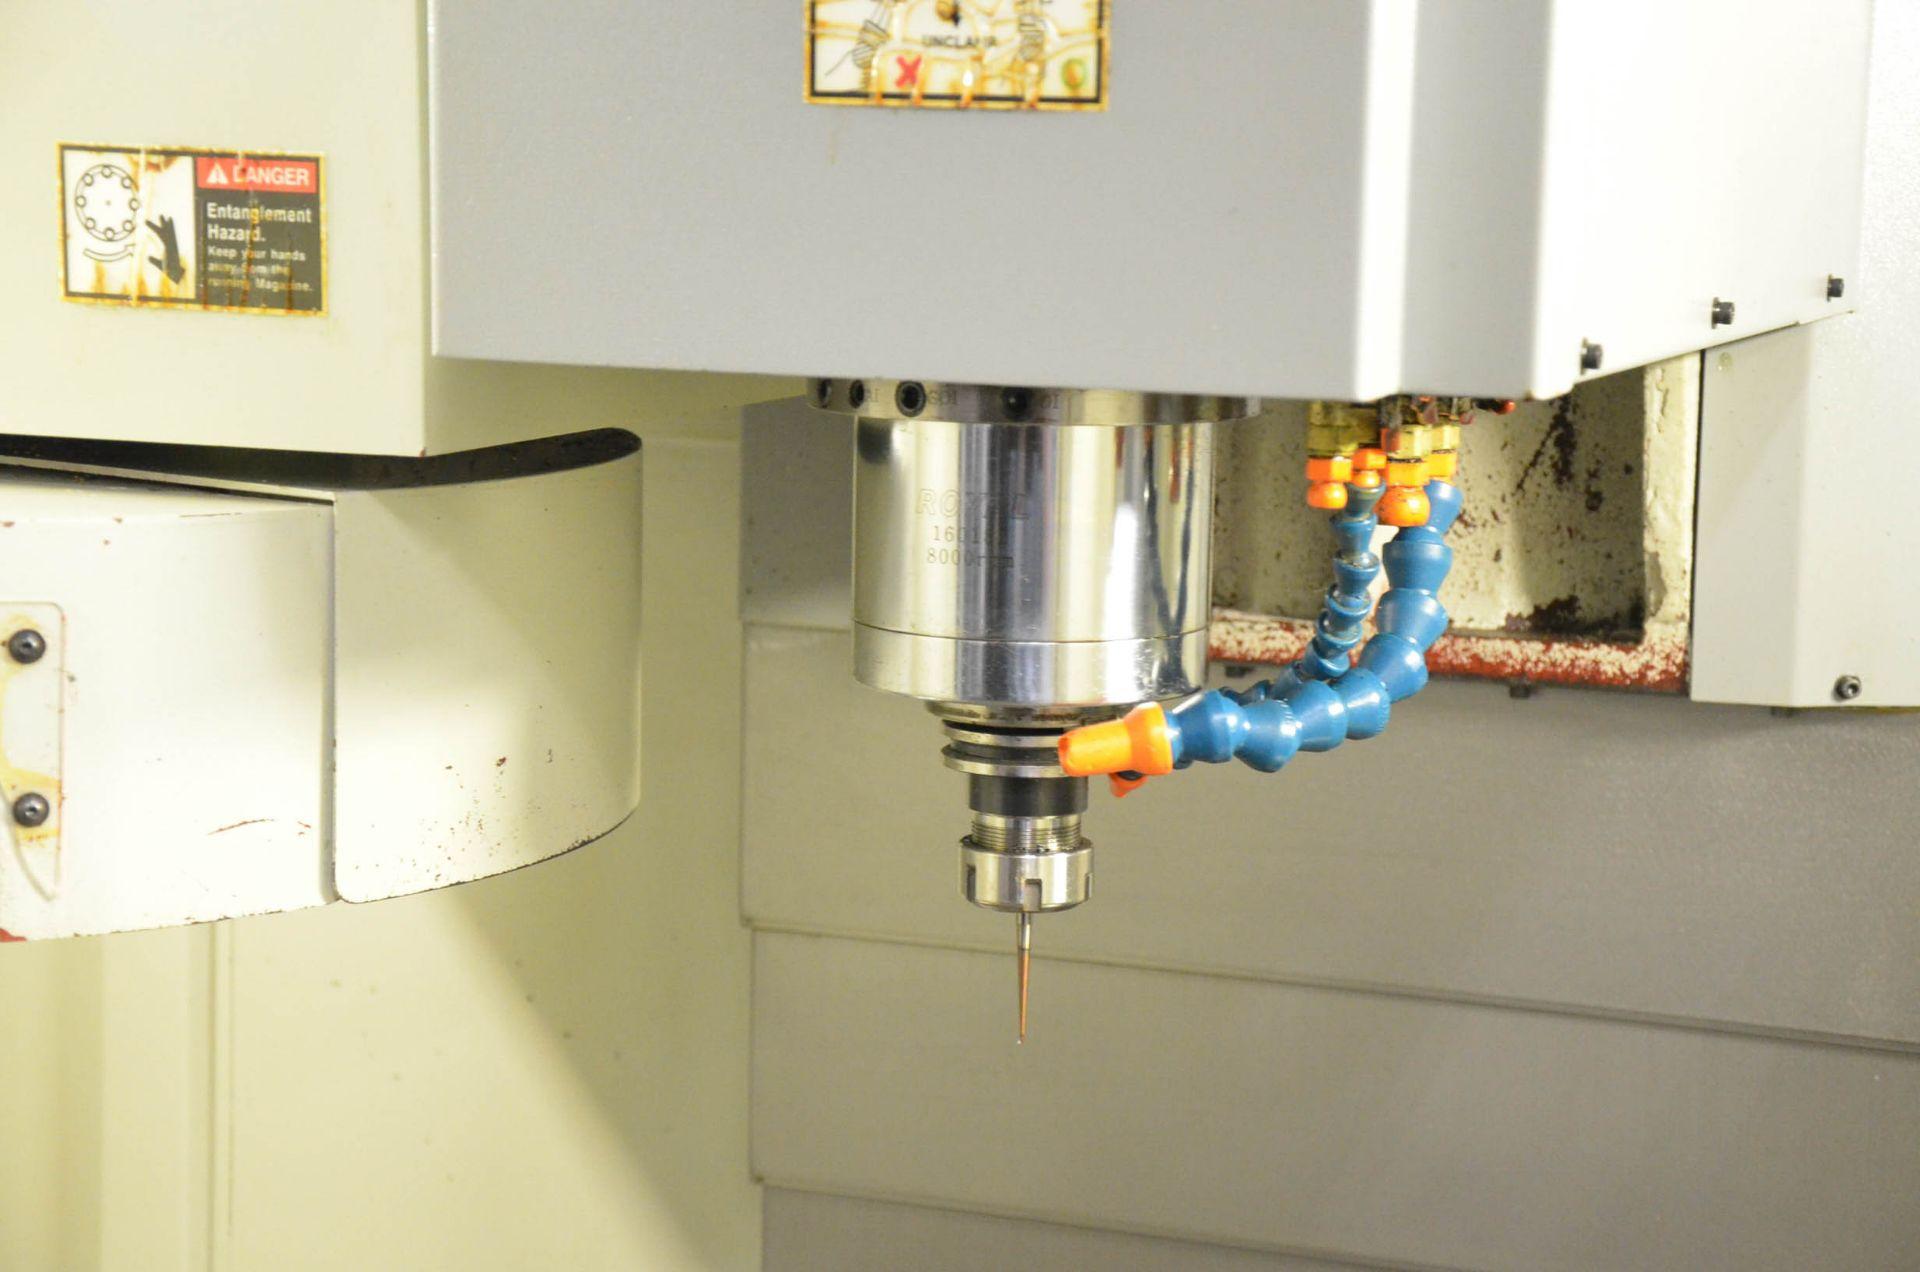 SWI (2012) TRAK LPM 4-AXIS READY CNC VERTICAL MACHINING CENTER WITH PROTO TRAK PMX CNC CONTROL, 19. - Image 6 of 10